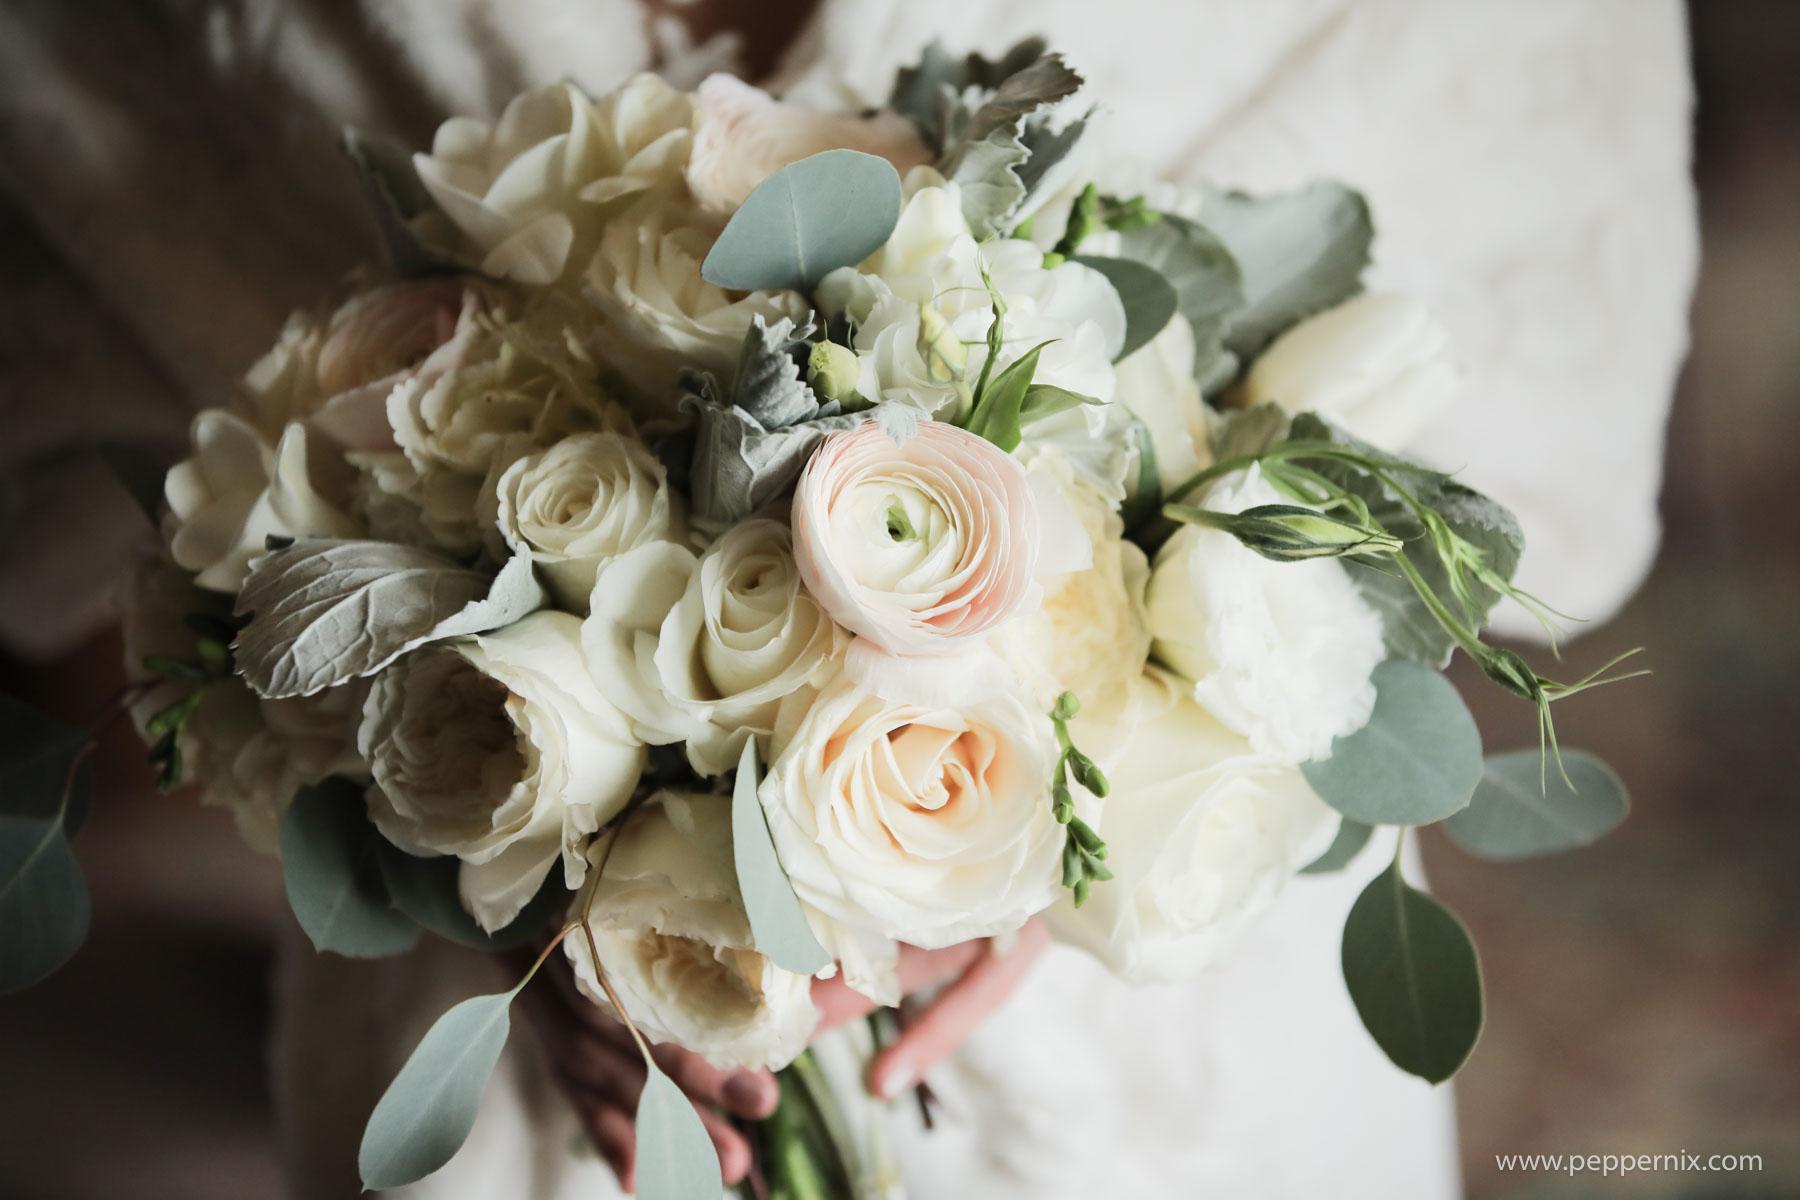 Photo: Pepper Nix Photography  Florist: Artisan Bloom